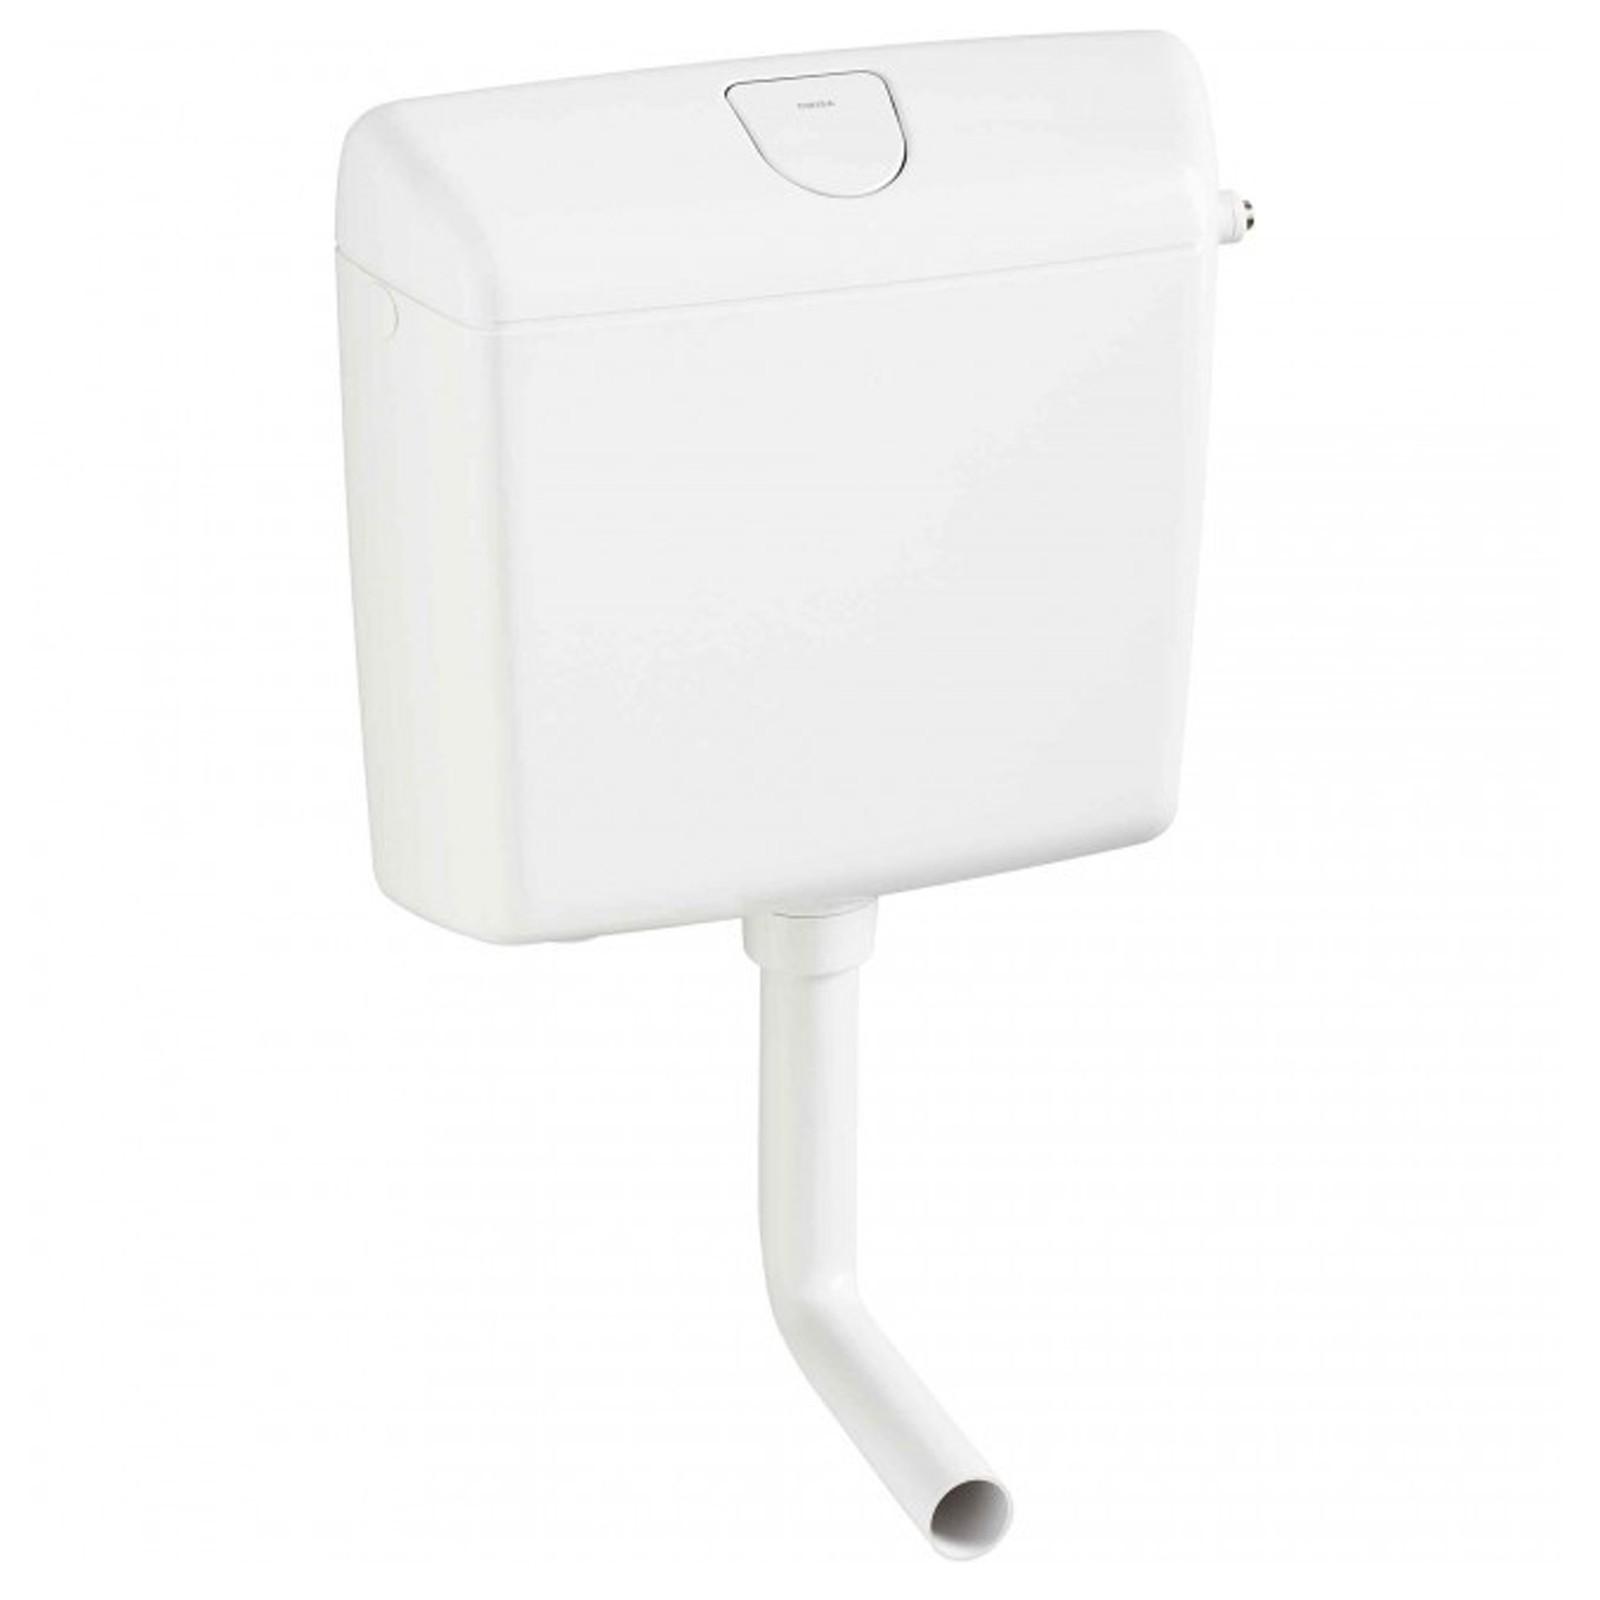 wisa 1070 wc sp lkasten aufputz toilette sp lung 6 9 l. Black Bedroom Furniture Sets. Home Design Ideas